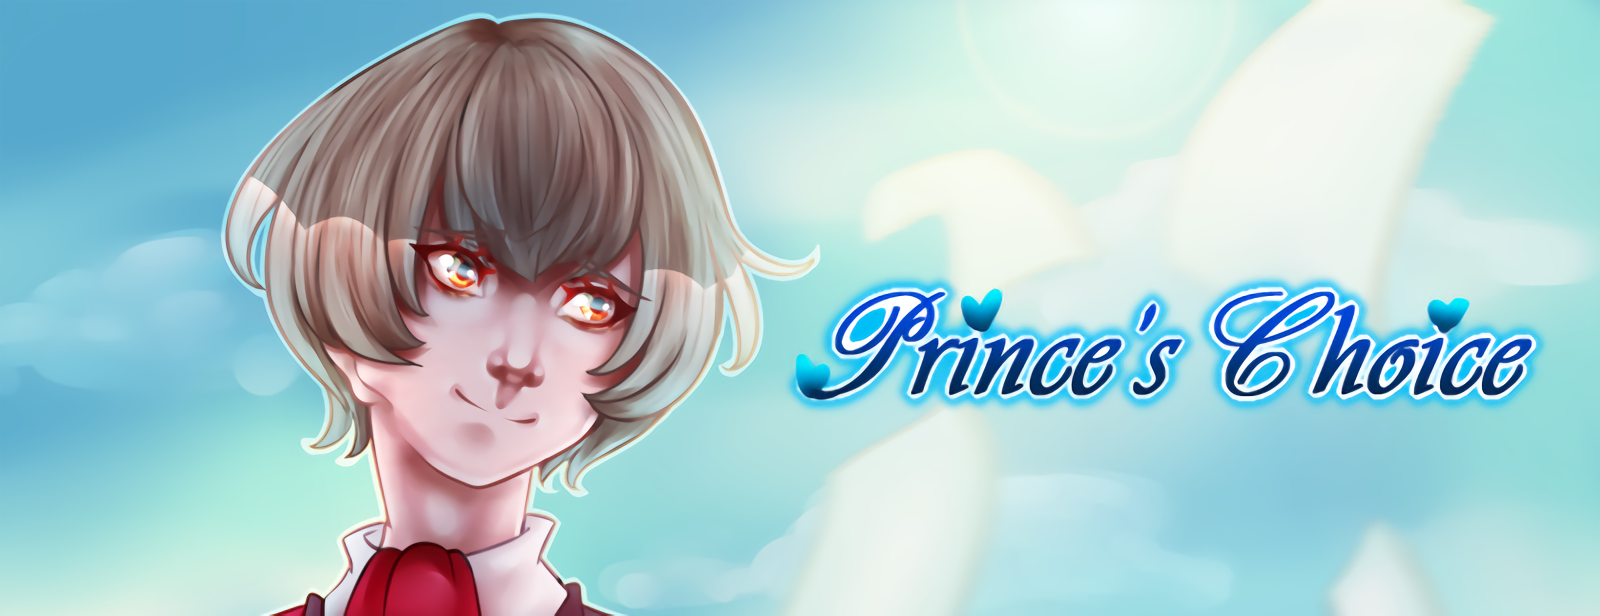 Prince's Choice (Demo)